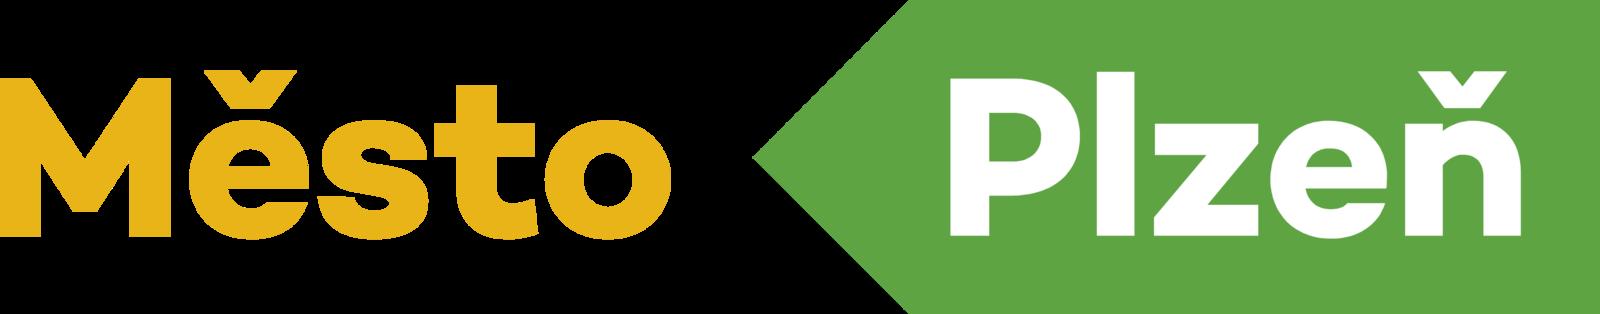 Image result for město plzeň logo